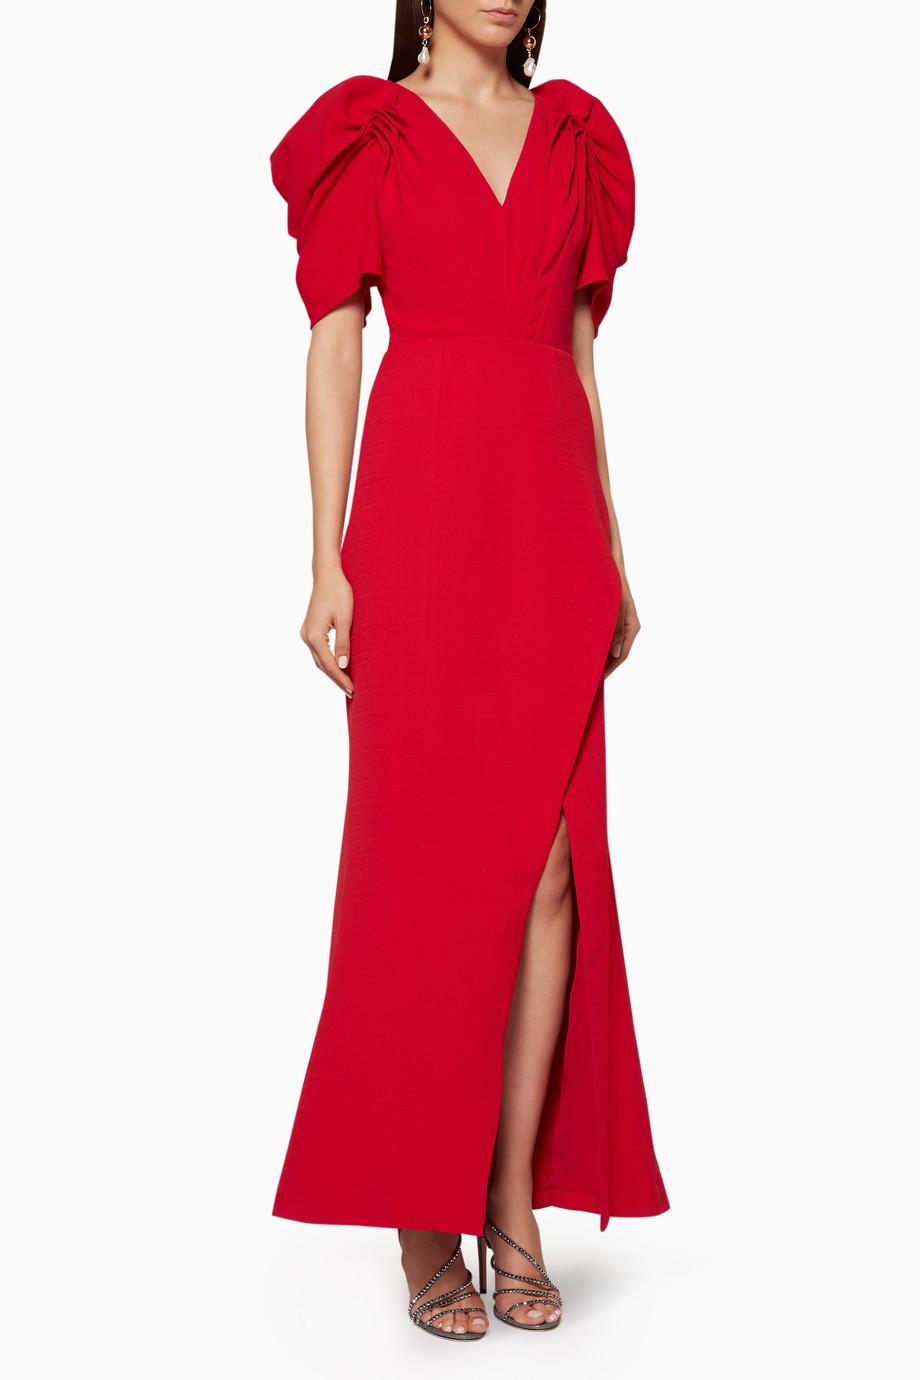 71bba31e5 تسوق فستان سهرة فايسز طويل C/MEO أحمر للنساء   اُناس